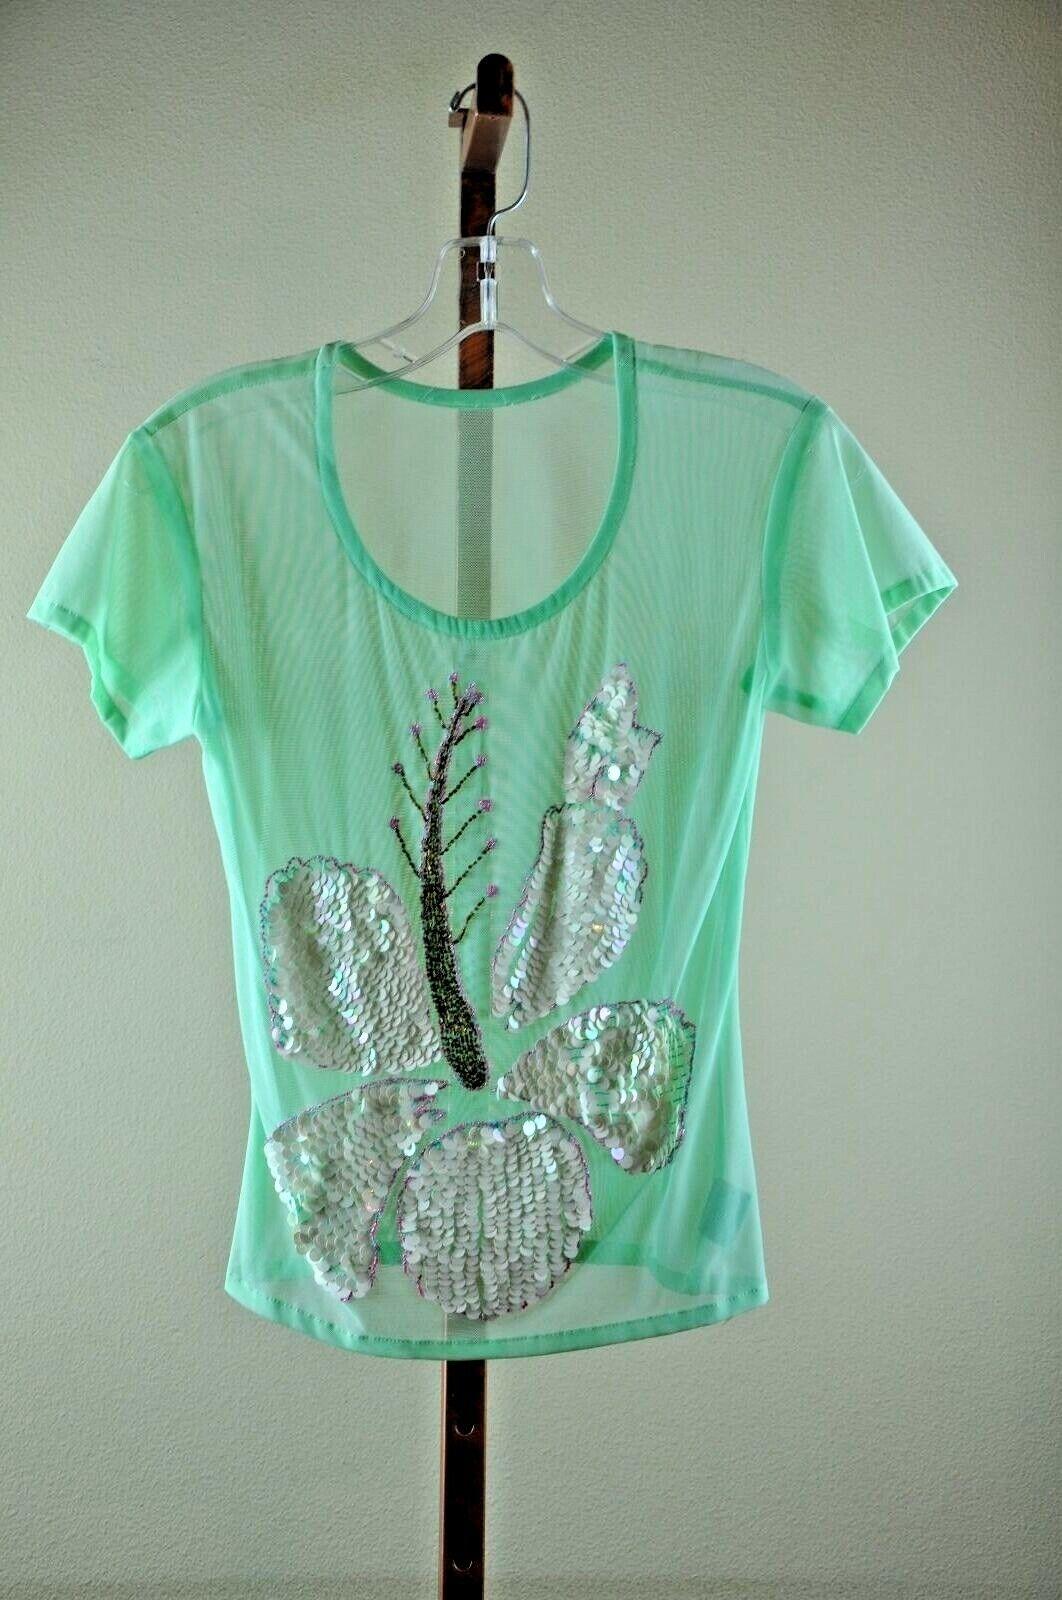 La Perla Mesh Cover Up  Embellished  Mint Tee Short Sleeve L